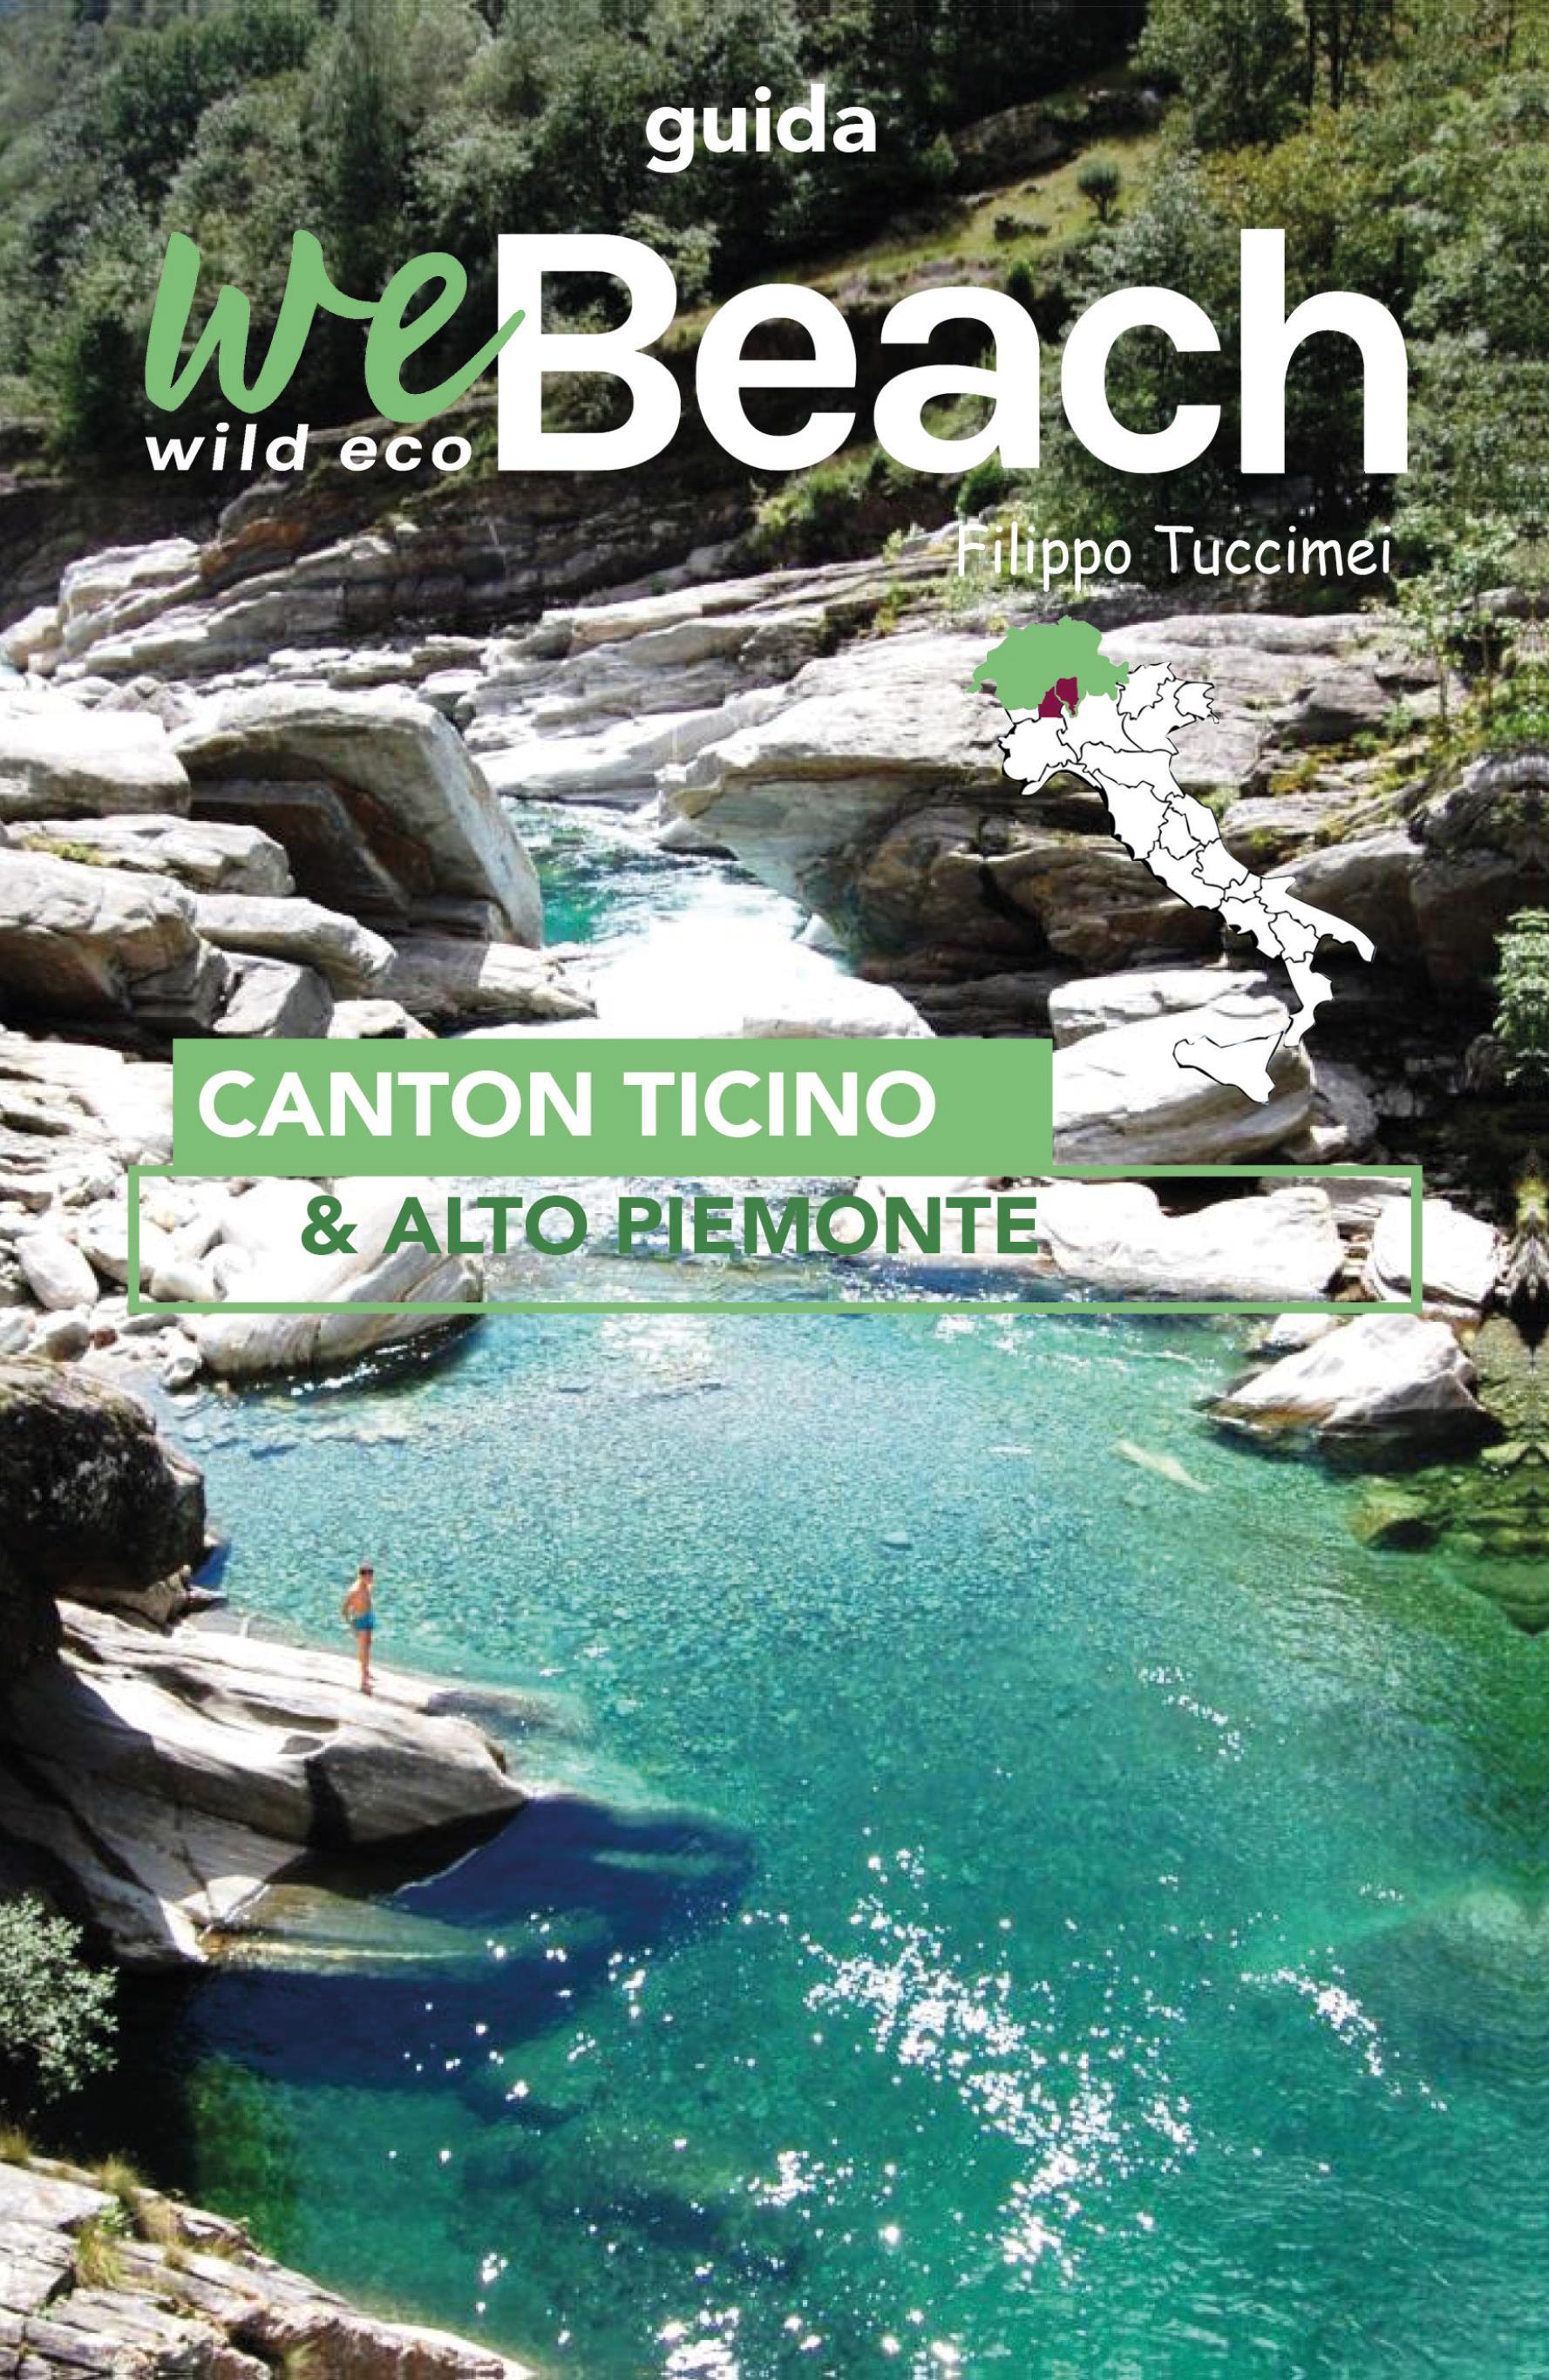 weBeach - Canton Ticino e Alto Piemonte